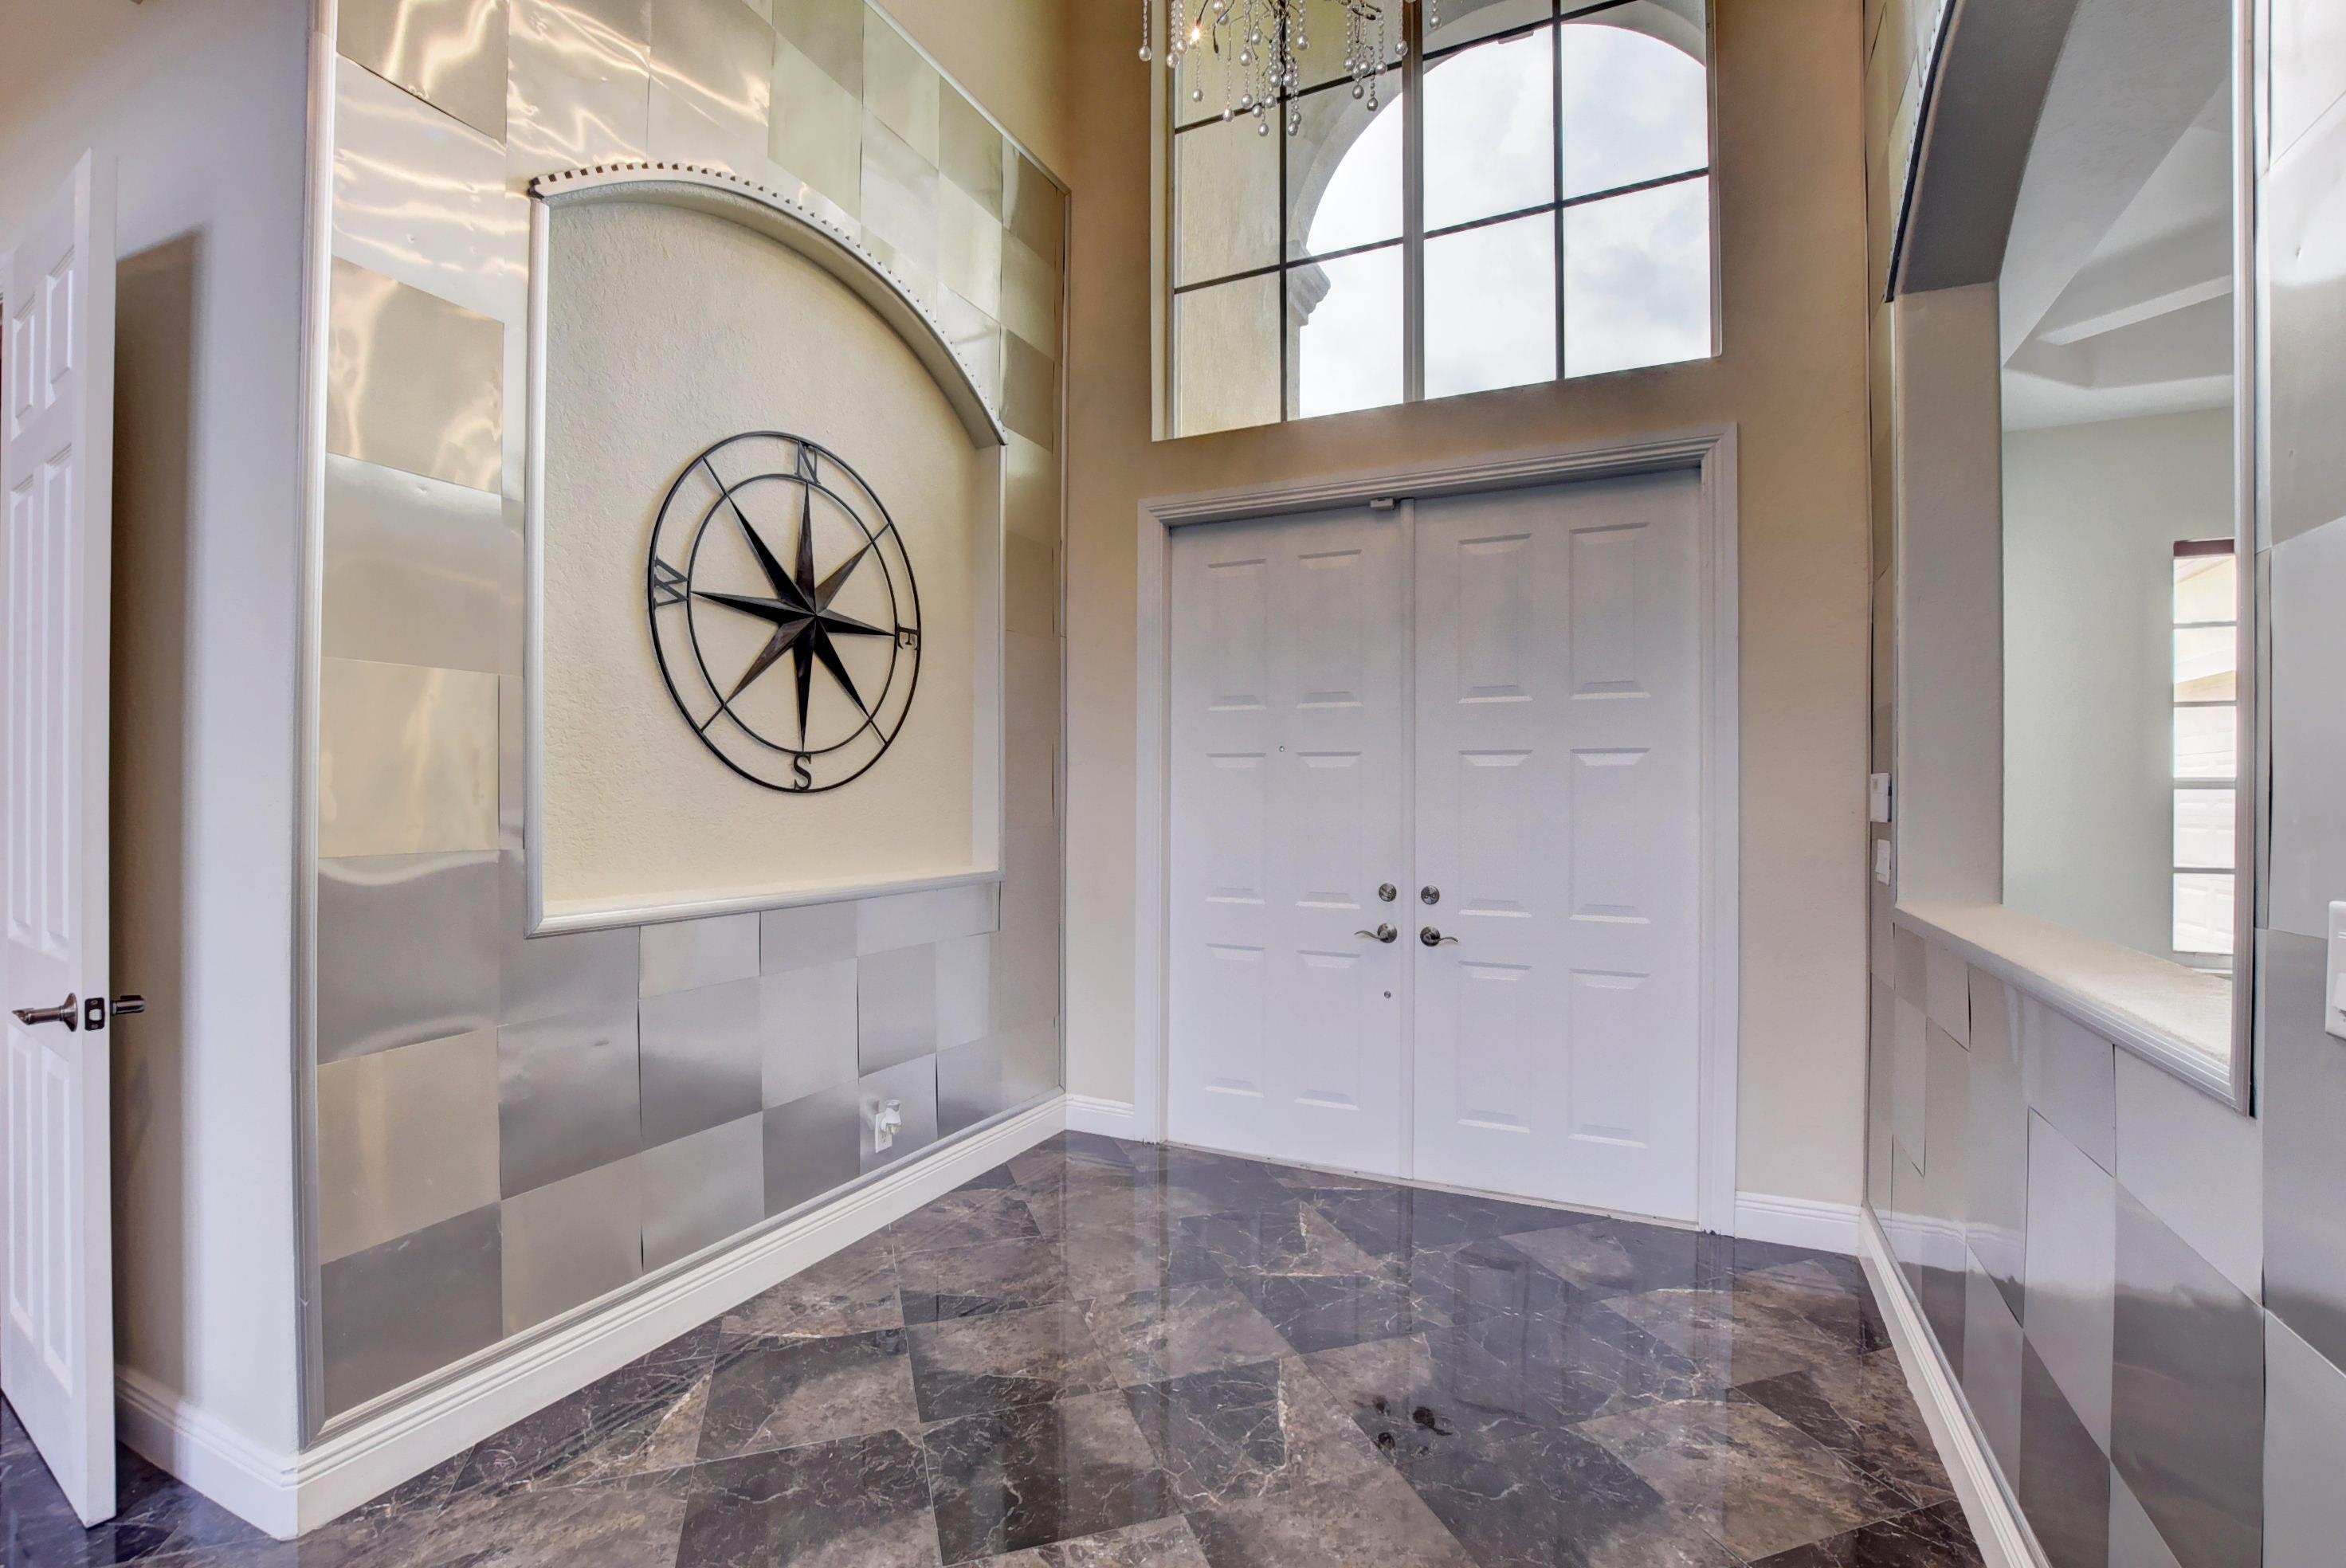 12365 Equine Lane, Wellington, Florida 33414, 5 Bedrooms Bedrooms, ,5 BathroomsBathrooms,Single Family,For Sale,Equine,RX-10518588